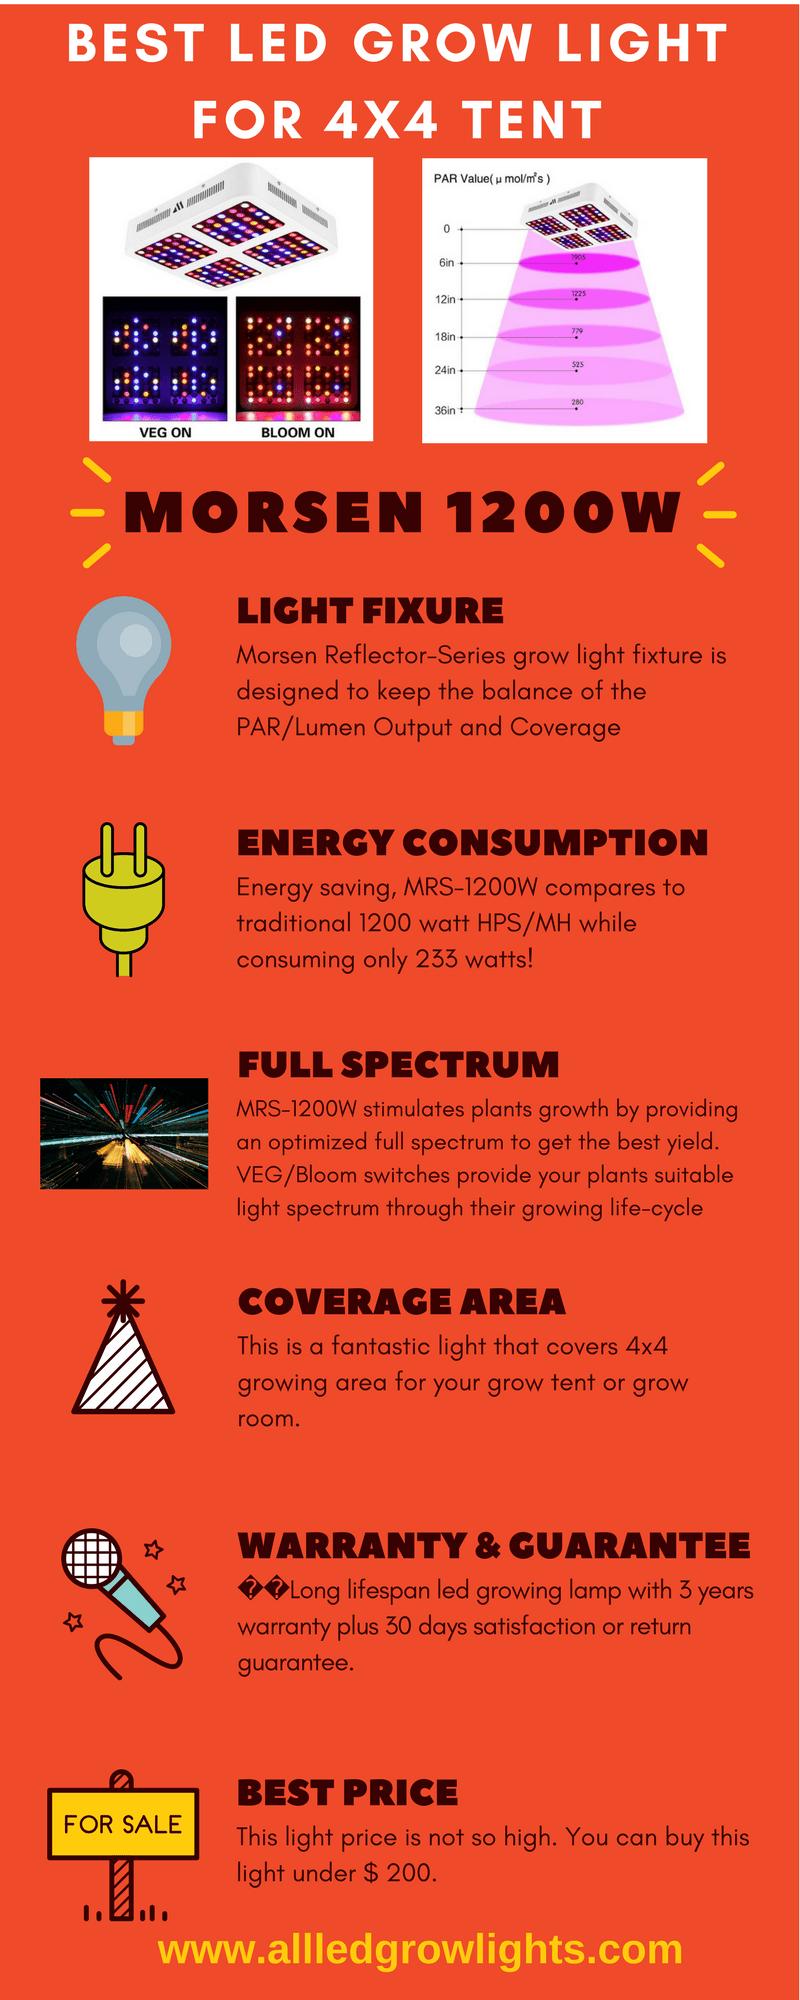 best led light for 4x4 tent infograph